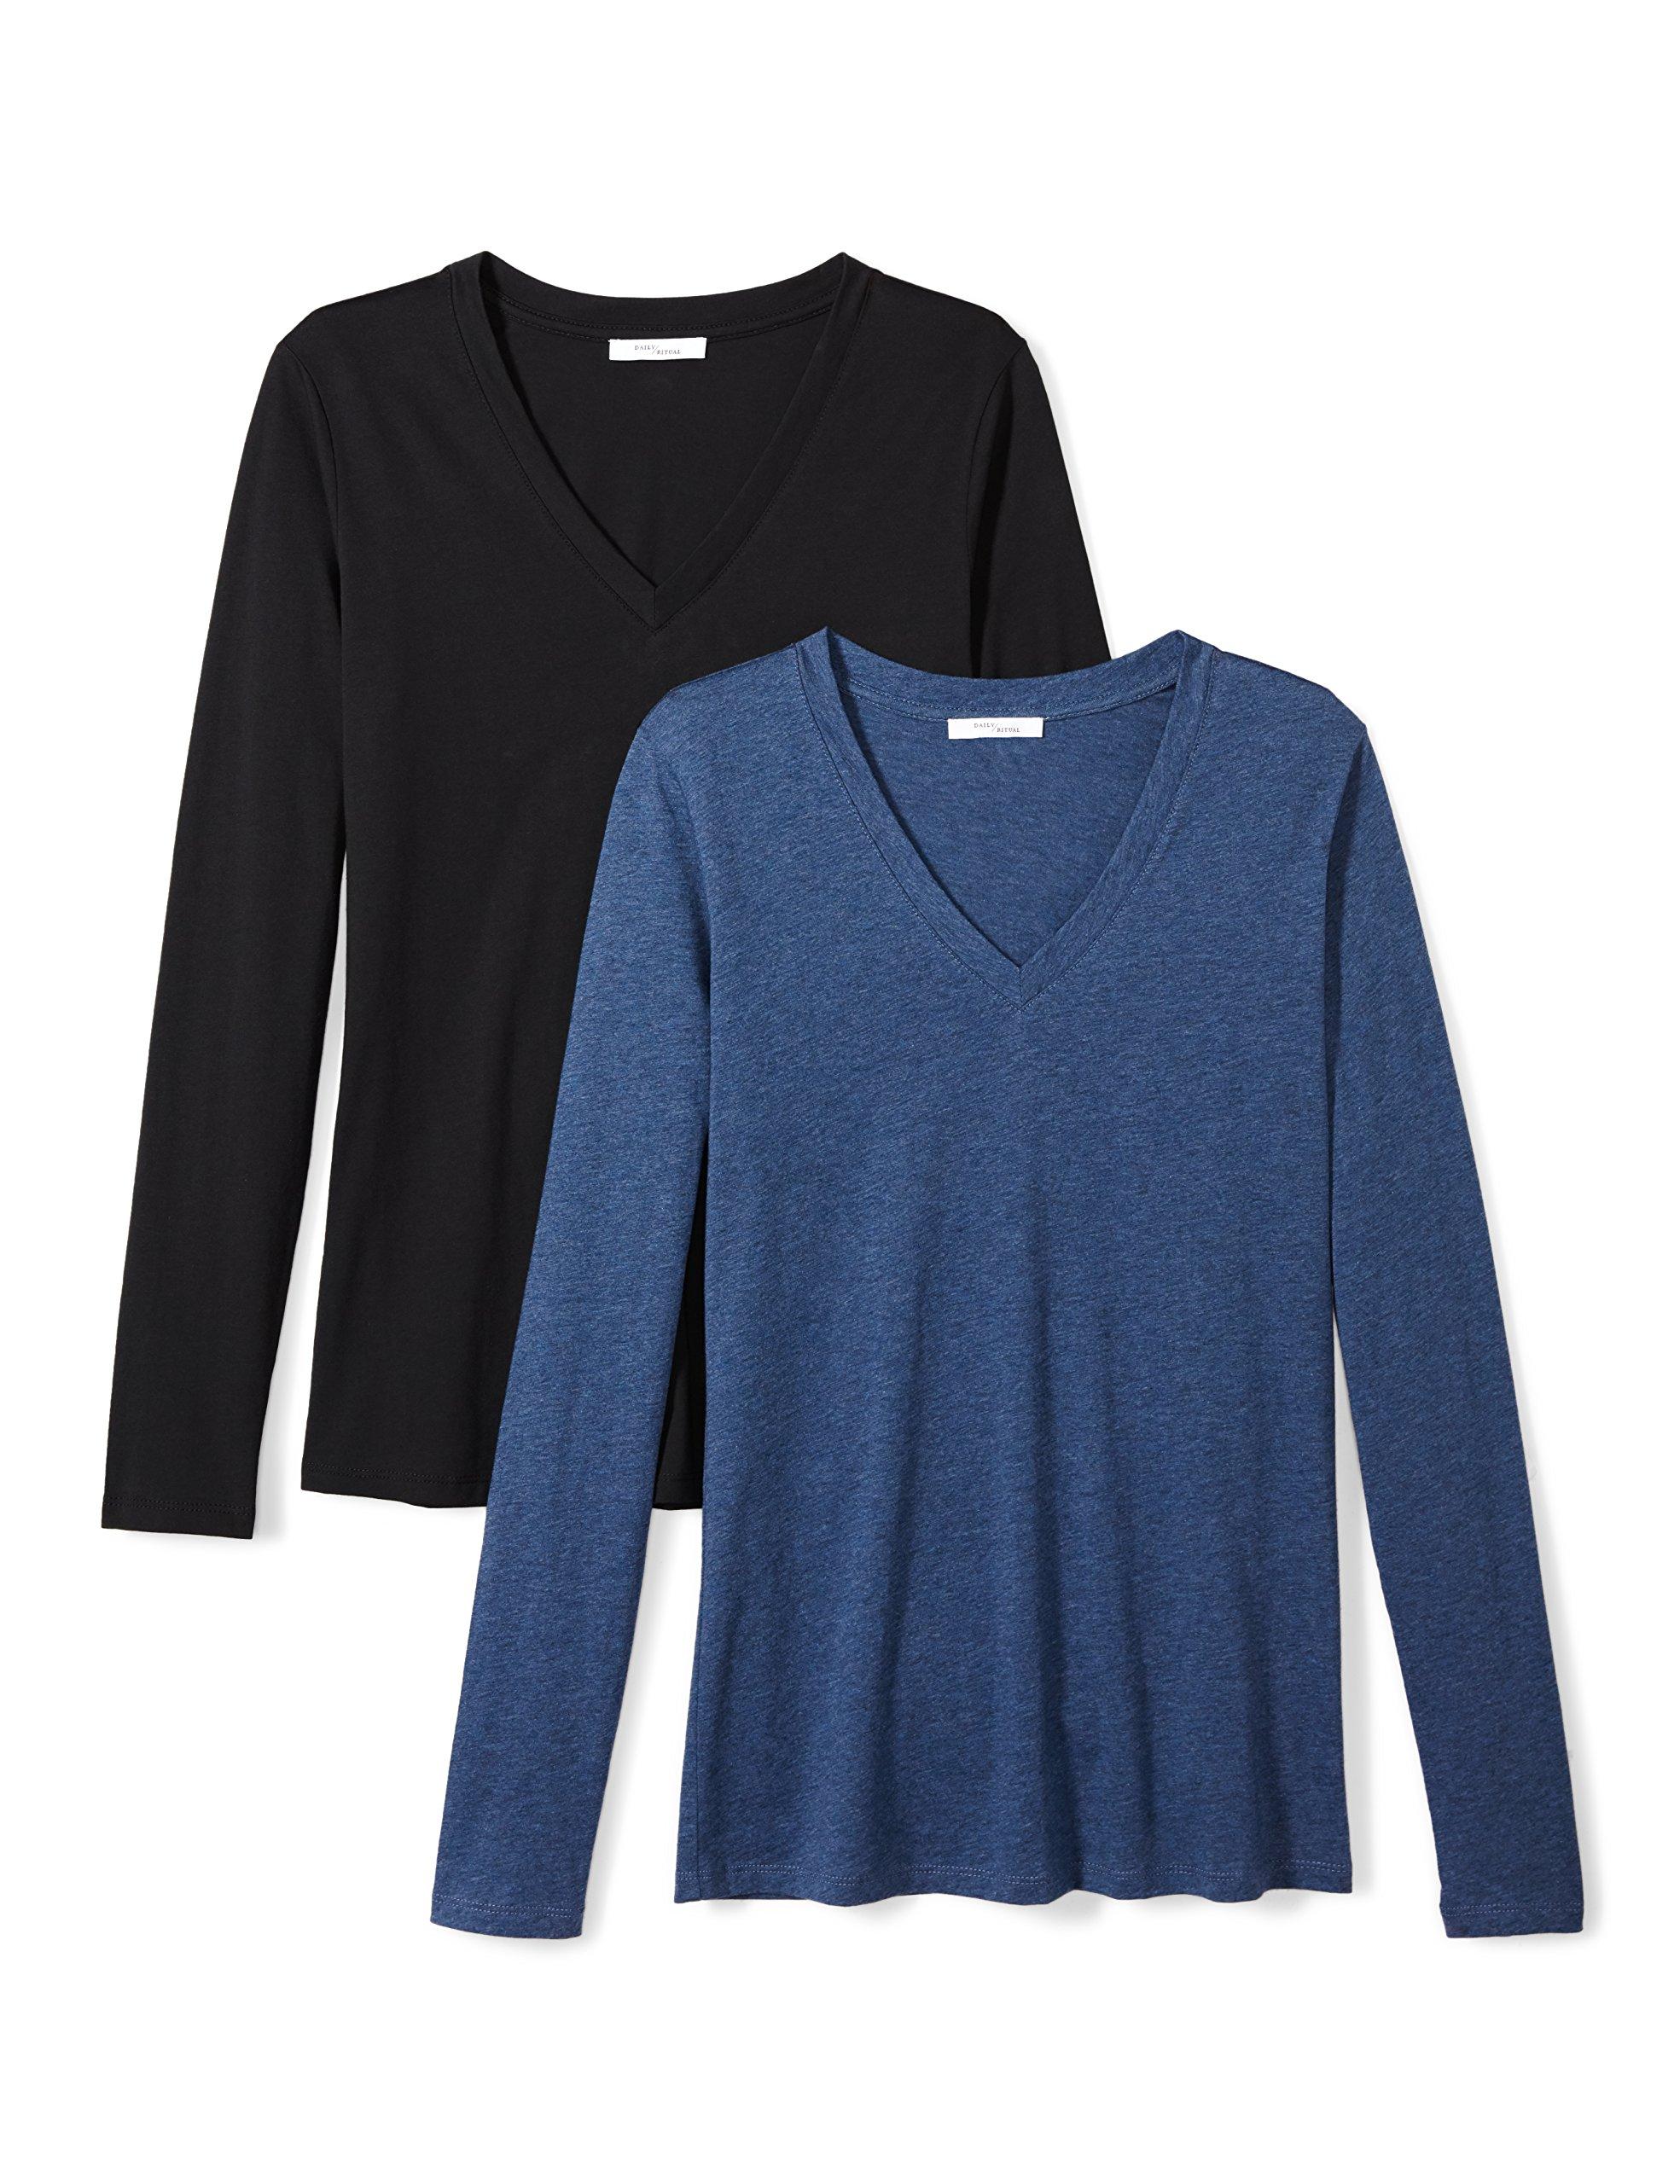 Daily Ritual Women's Lightweight 100% Supima Cotton Long-Sleeve V-Neck T-Shirt, 2-Pack, XXL, Black/Heather Blue